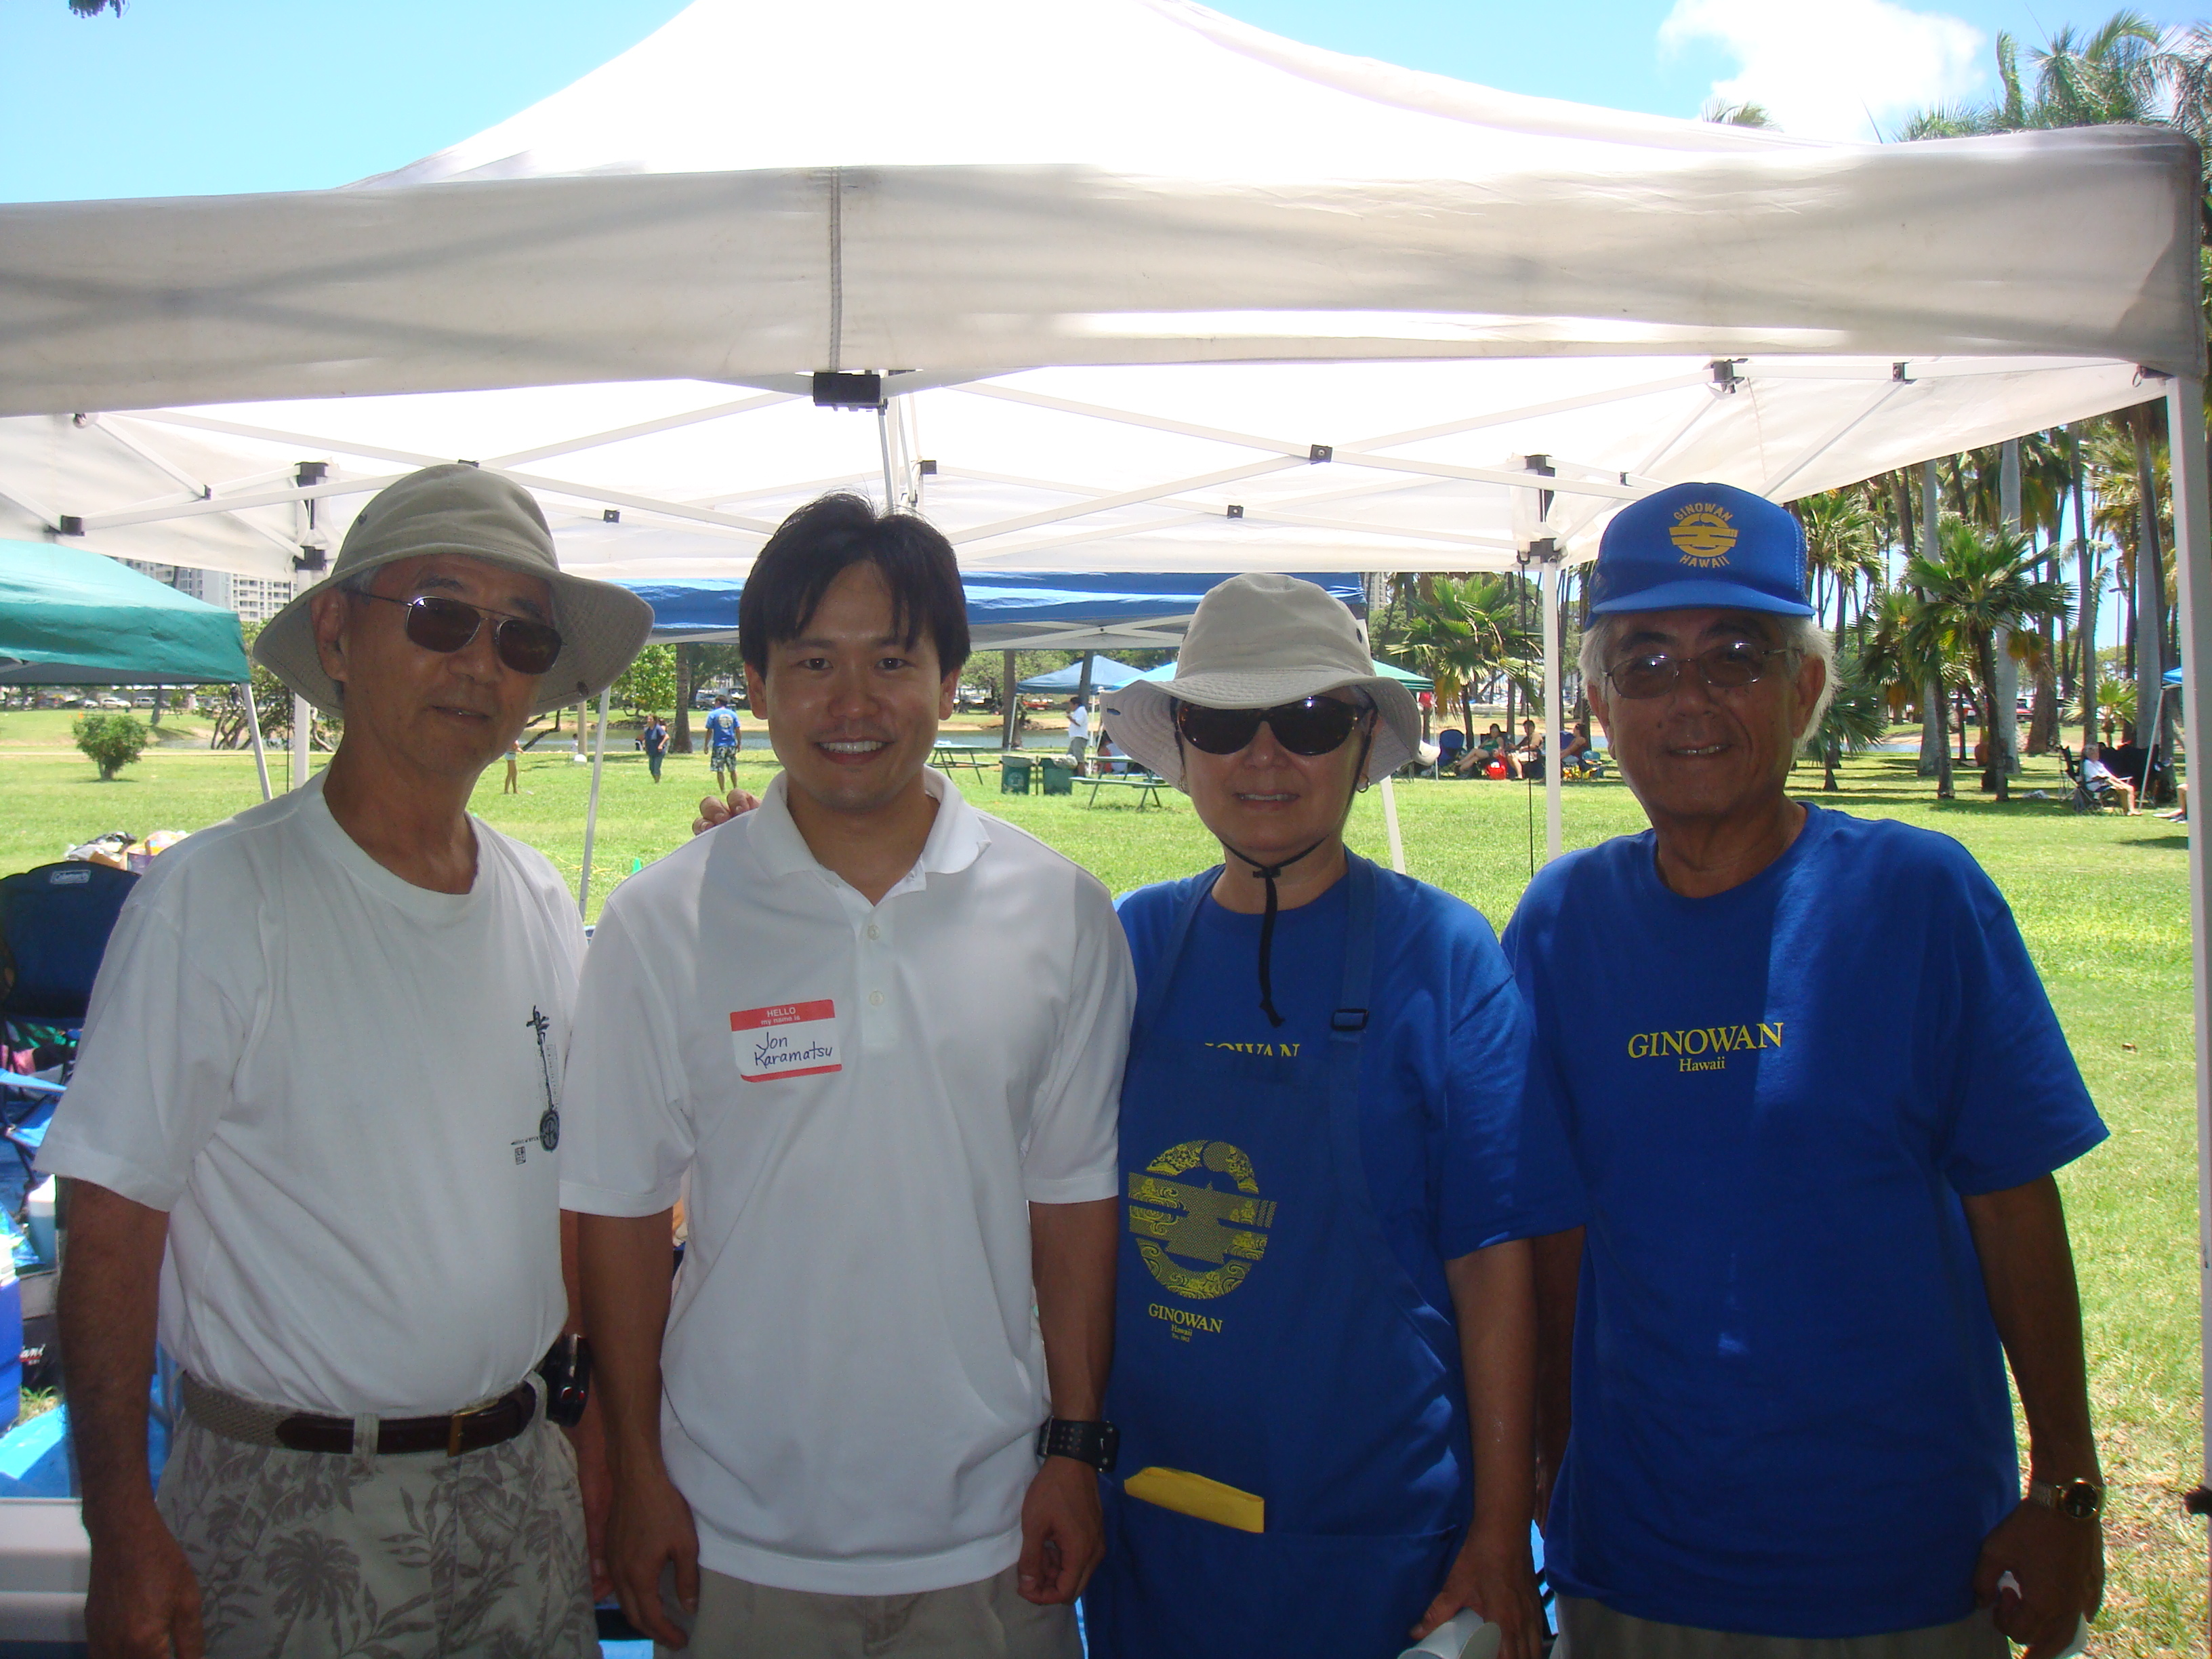 Friends from left to right: Stan Higa, Rep. Jon Riki Karamatsu, Christine Higa, and Stan's brother.